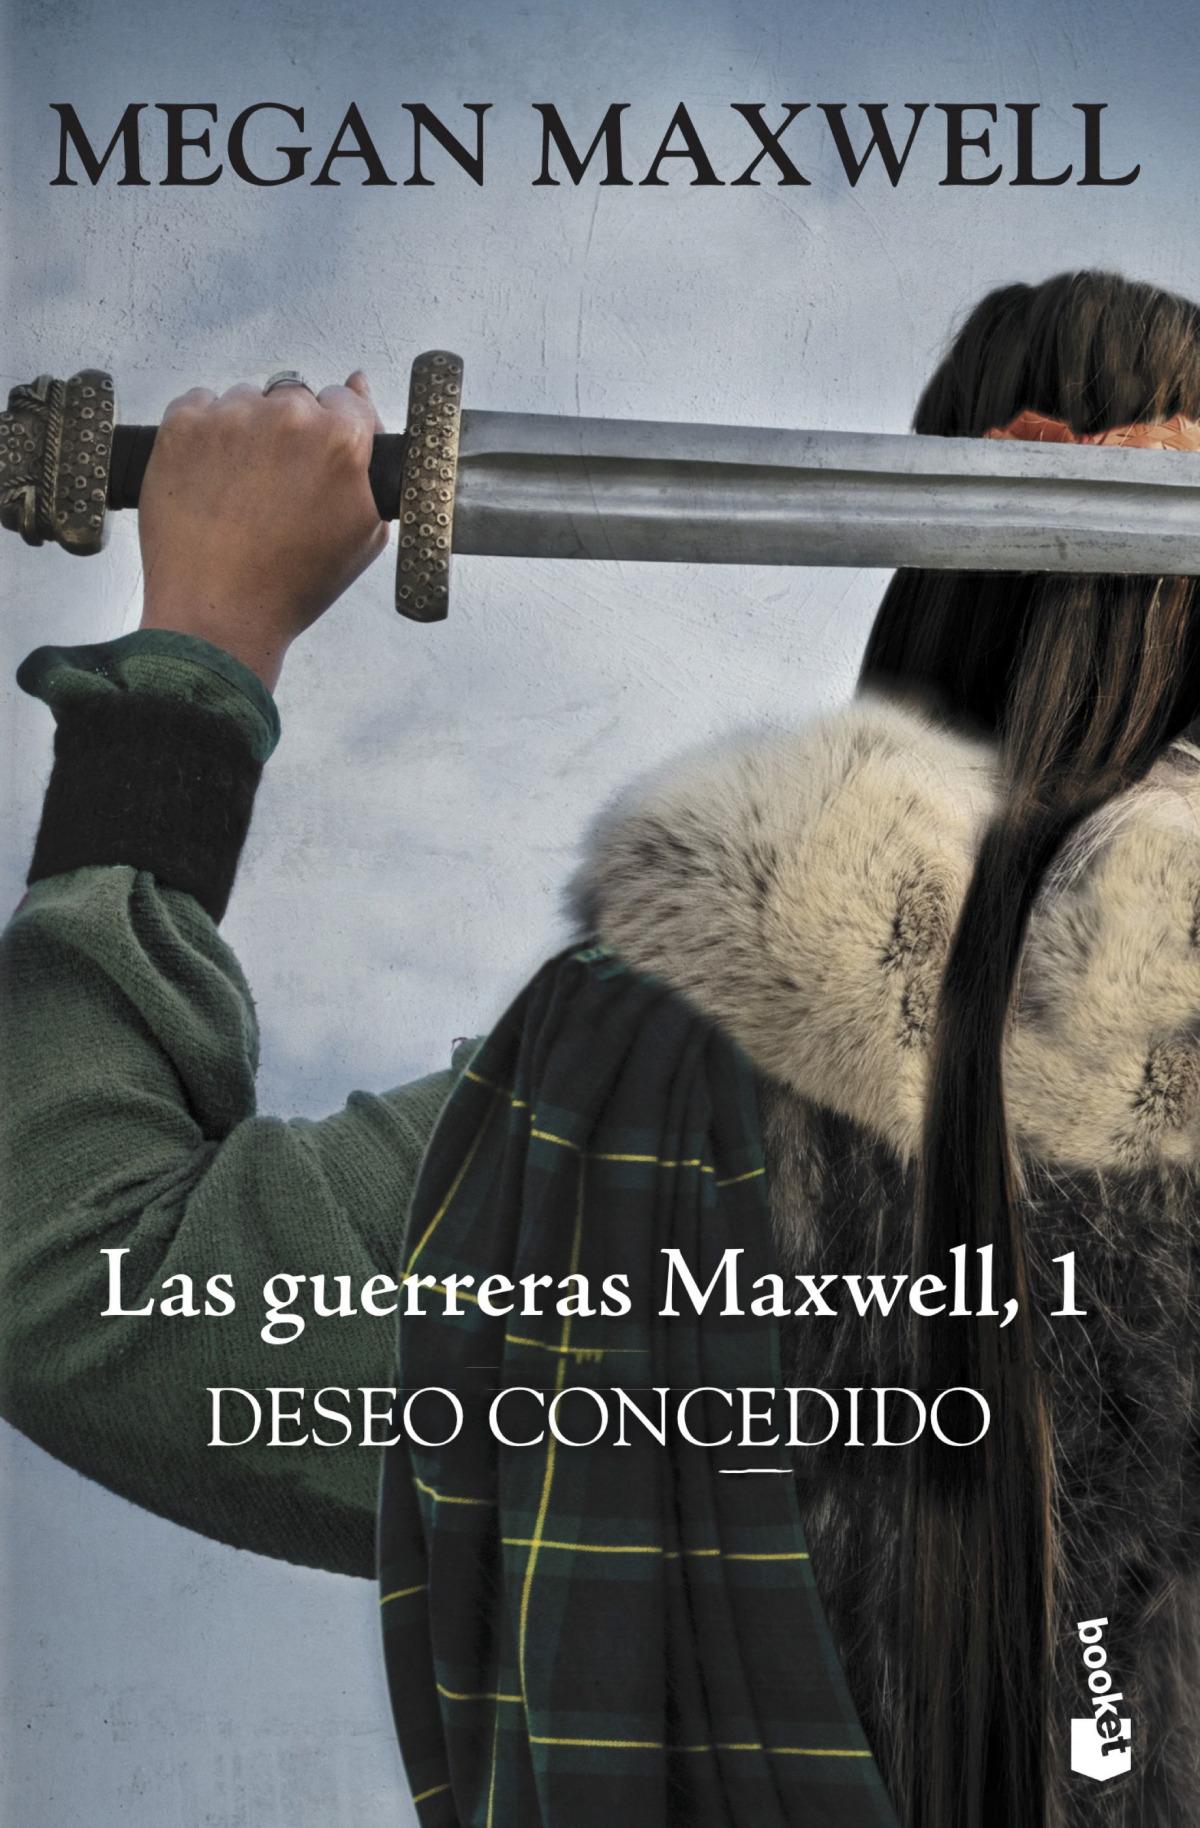 DESEO CONCEDIDO 9788408181125